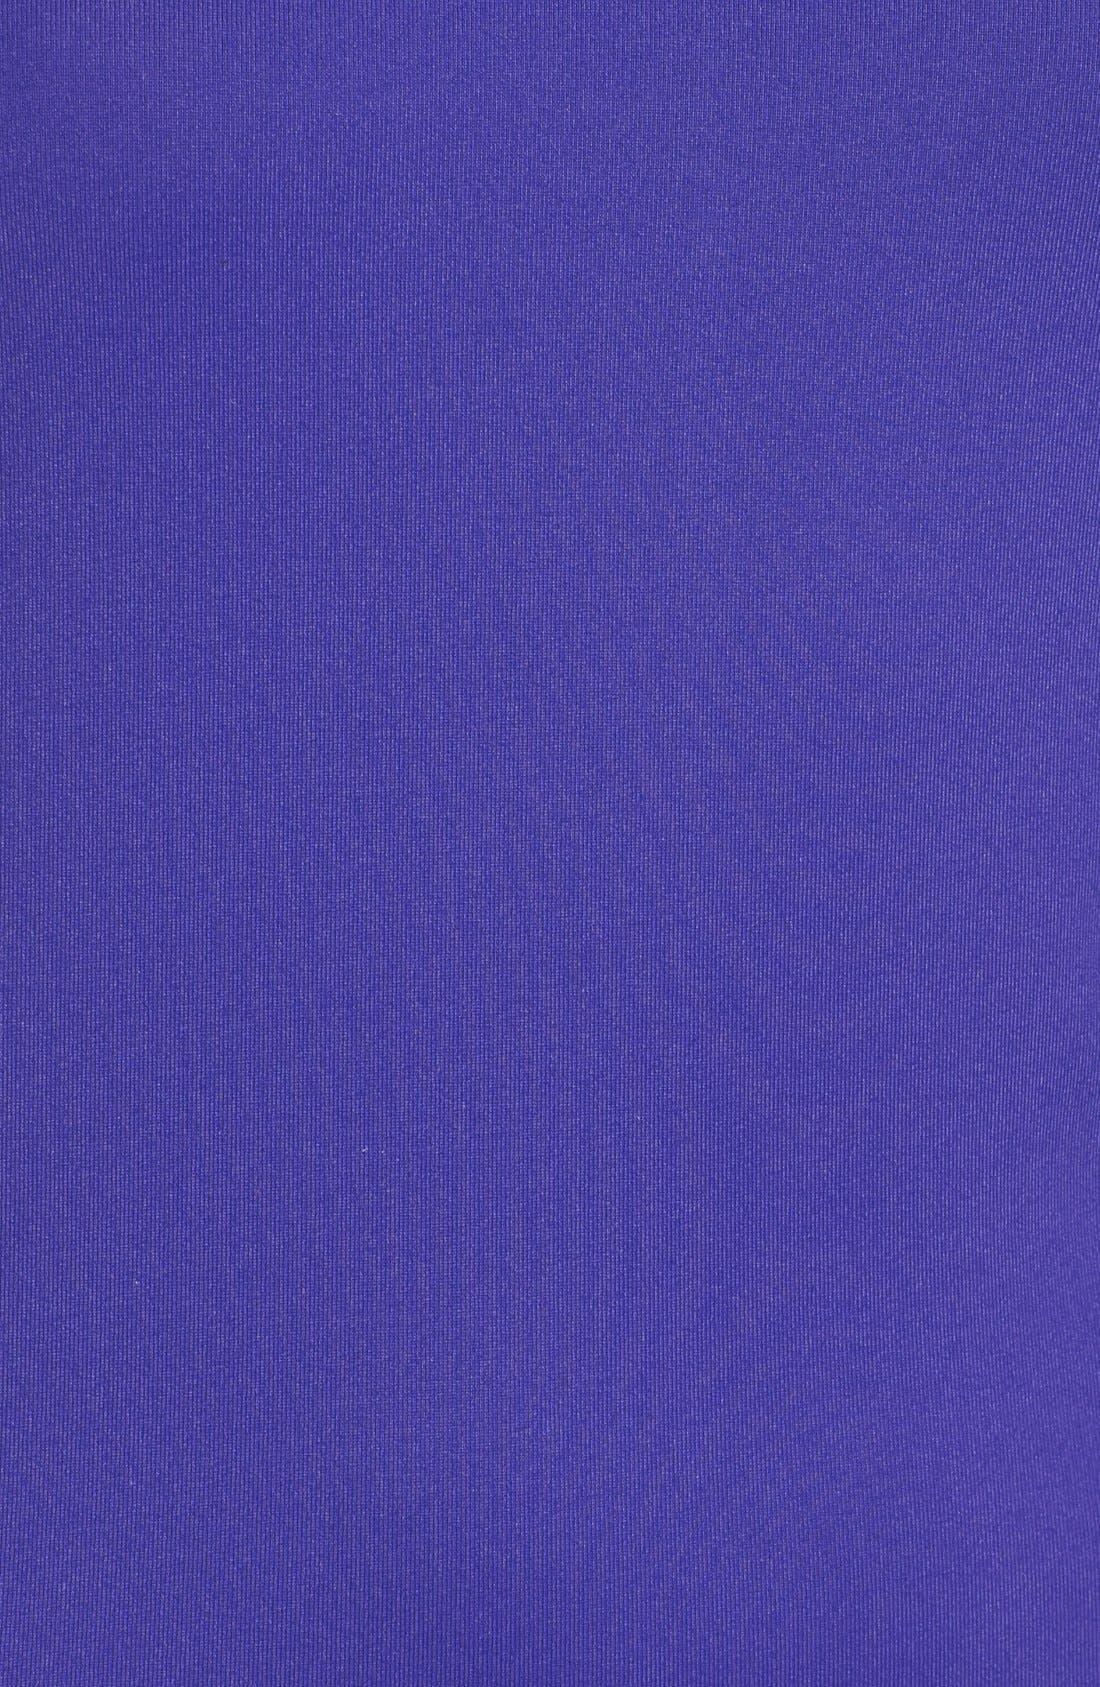 Alternate Image 5  - Leith V-Neck Body-Con Dress